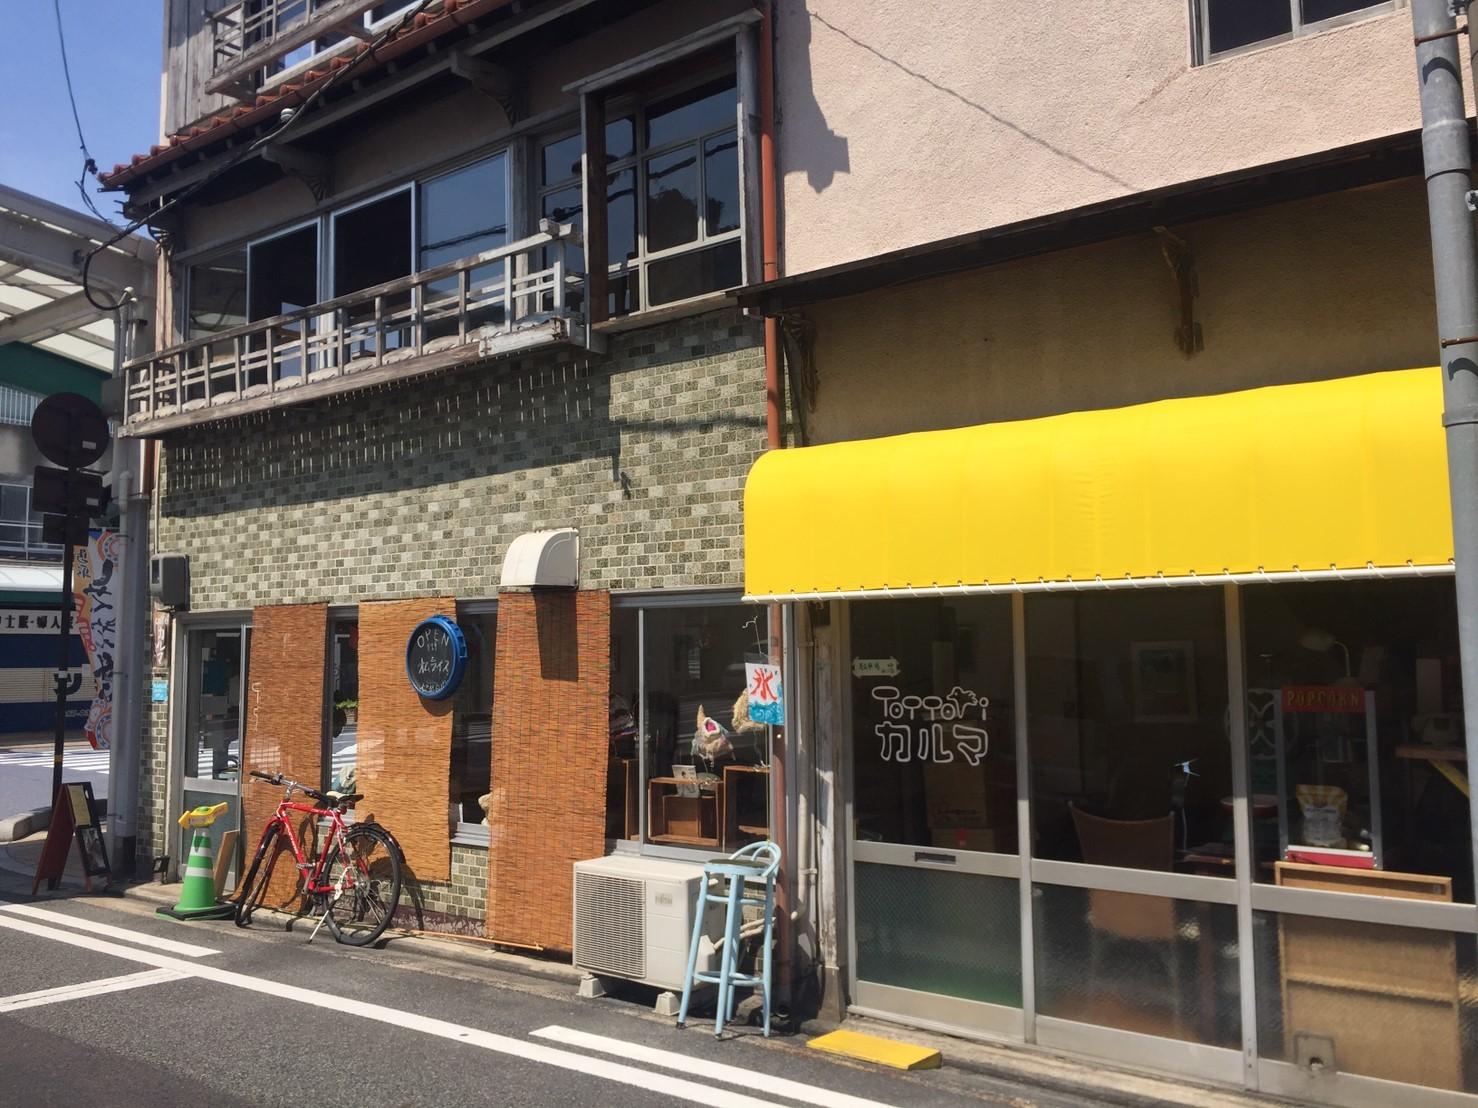 Tottori カルマ  カルマ焼飯_e0115904_15445643.jpg